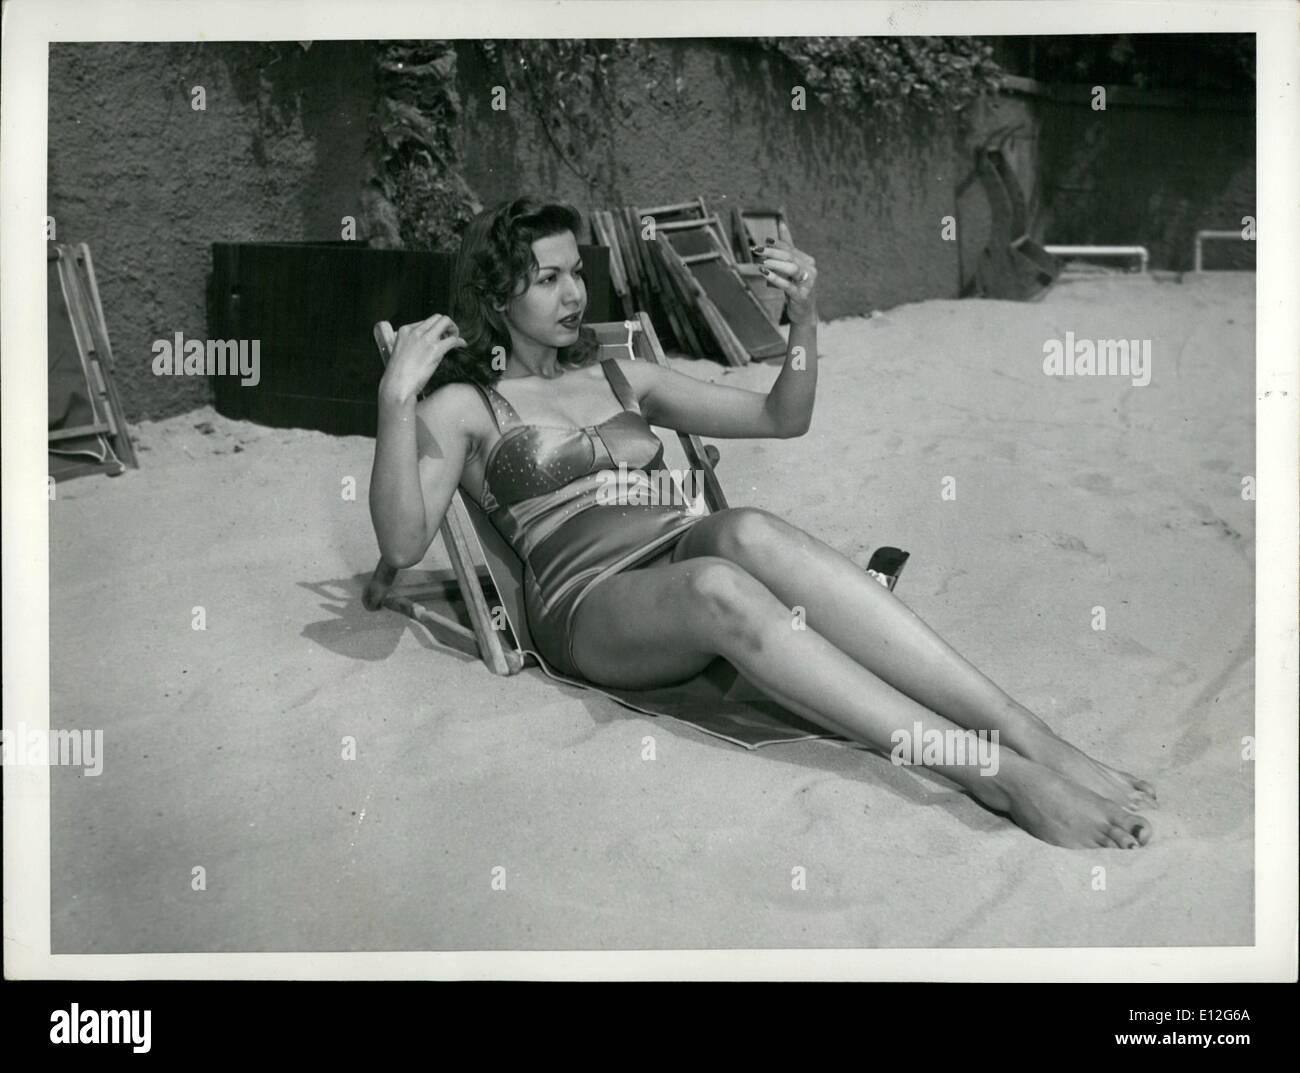 Jan. 09, 2012 - Samia Gamal - Egyptian movie star. - Stock Image